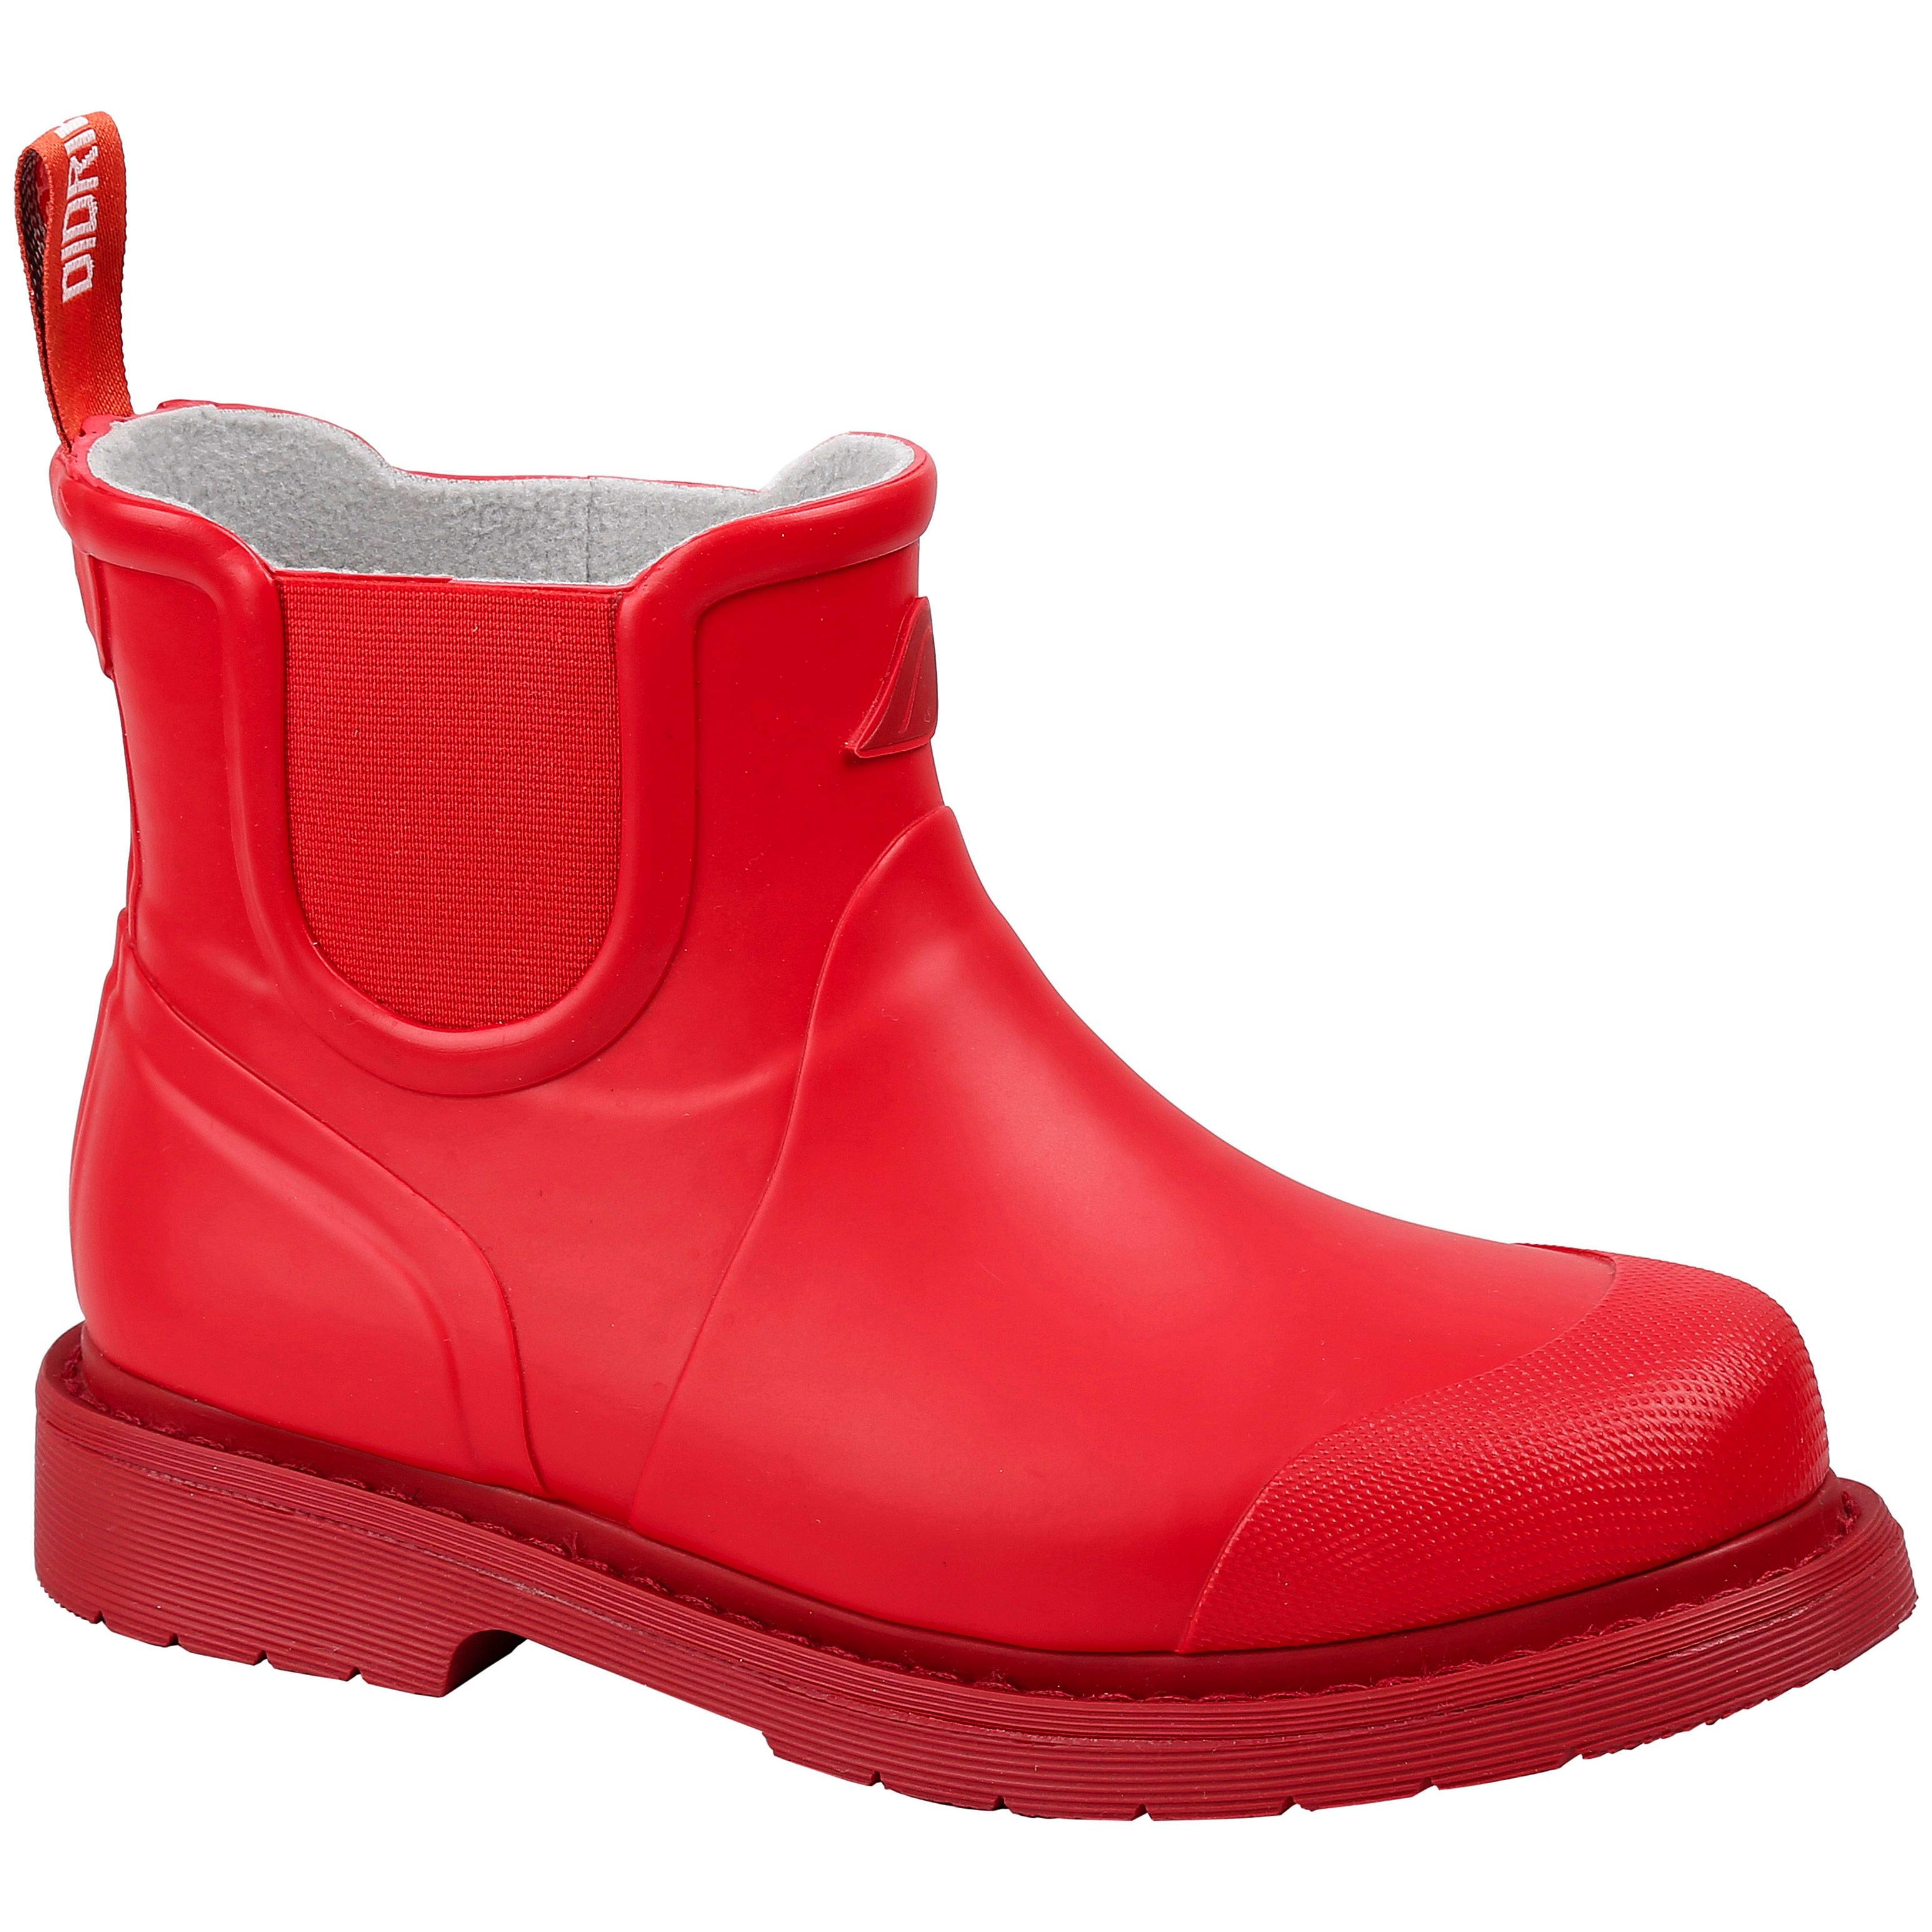 Vinga Women's Rubber Boots